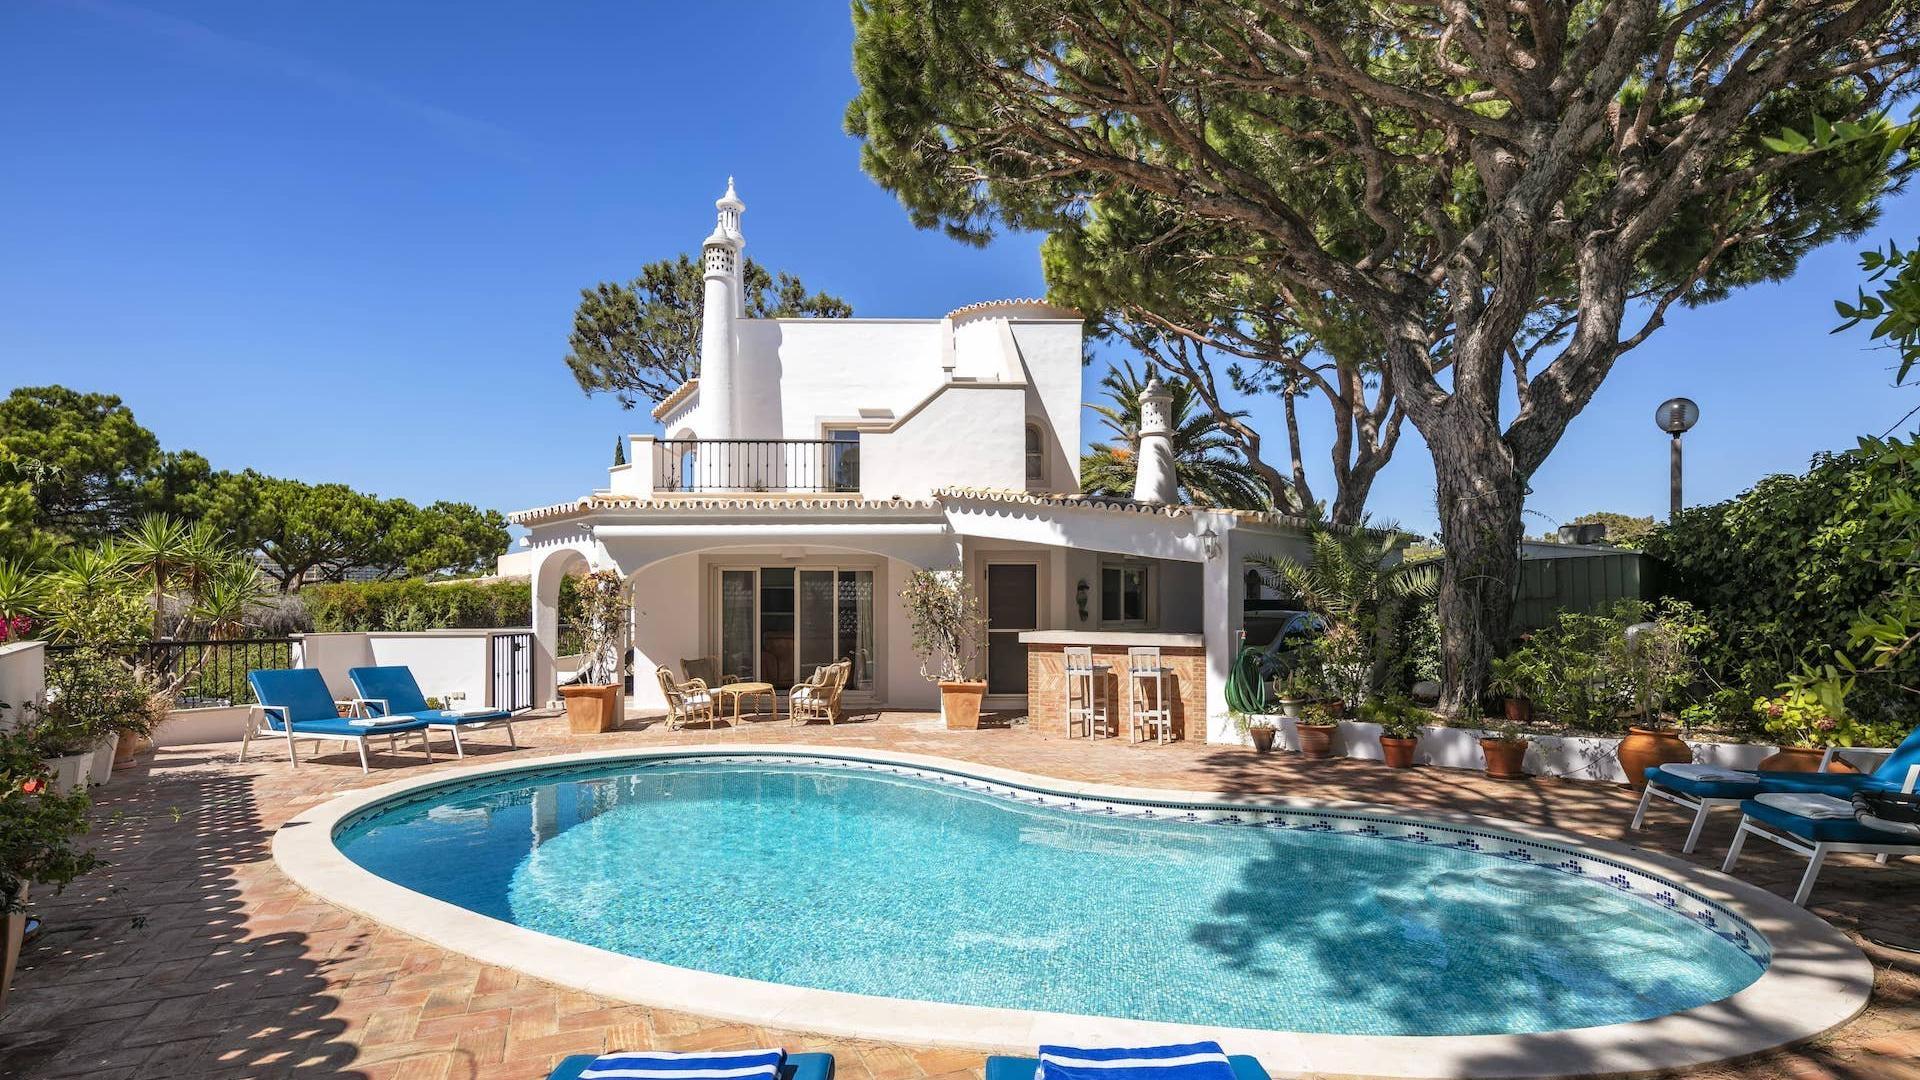 Villa Espada - Vale do Garrão, Vale do Lobo, Algarve - BACK_VIEW_OF_VILLA.jpg